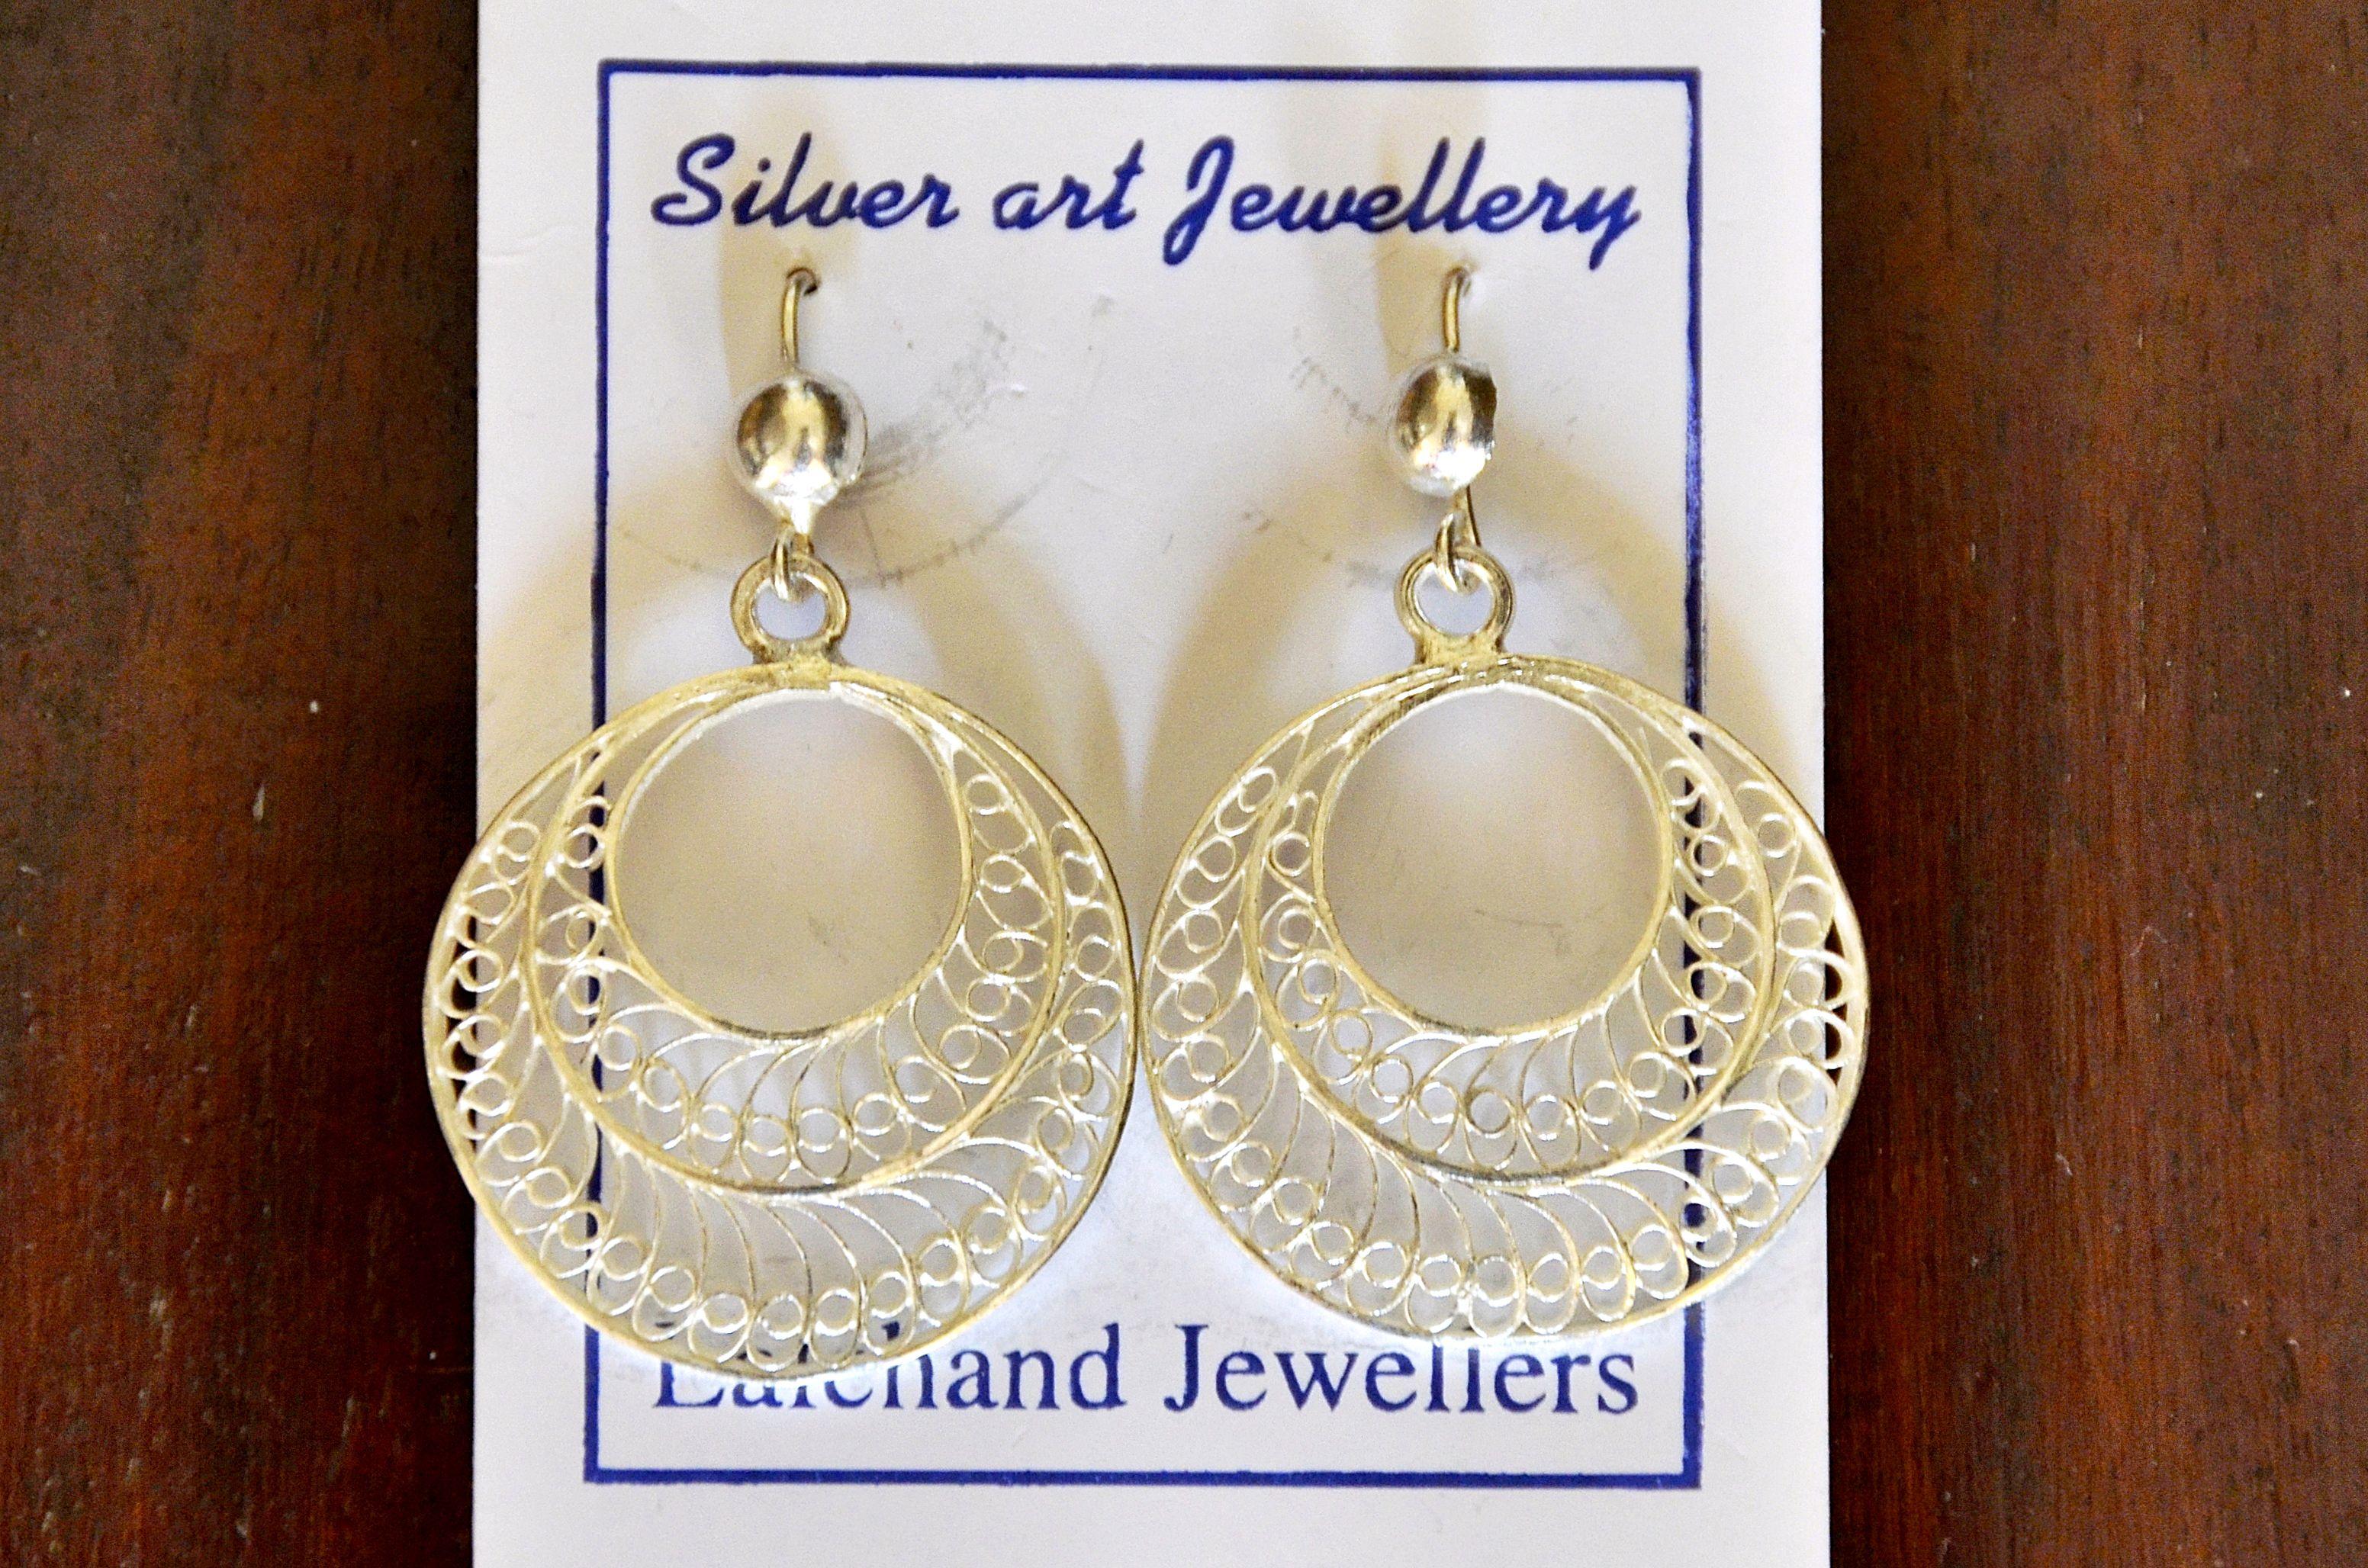 Filigrana de plata de Lalchand Jewelers, Bhubaneshwar